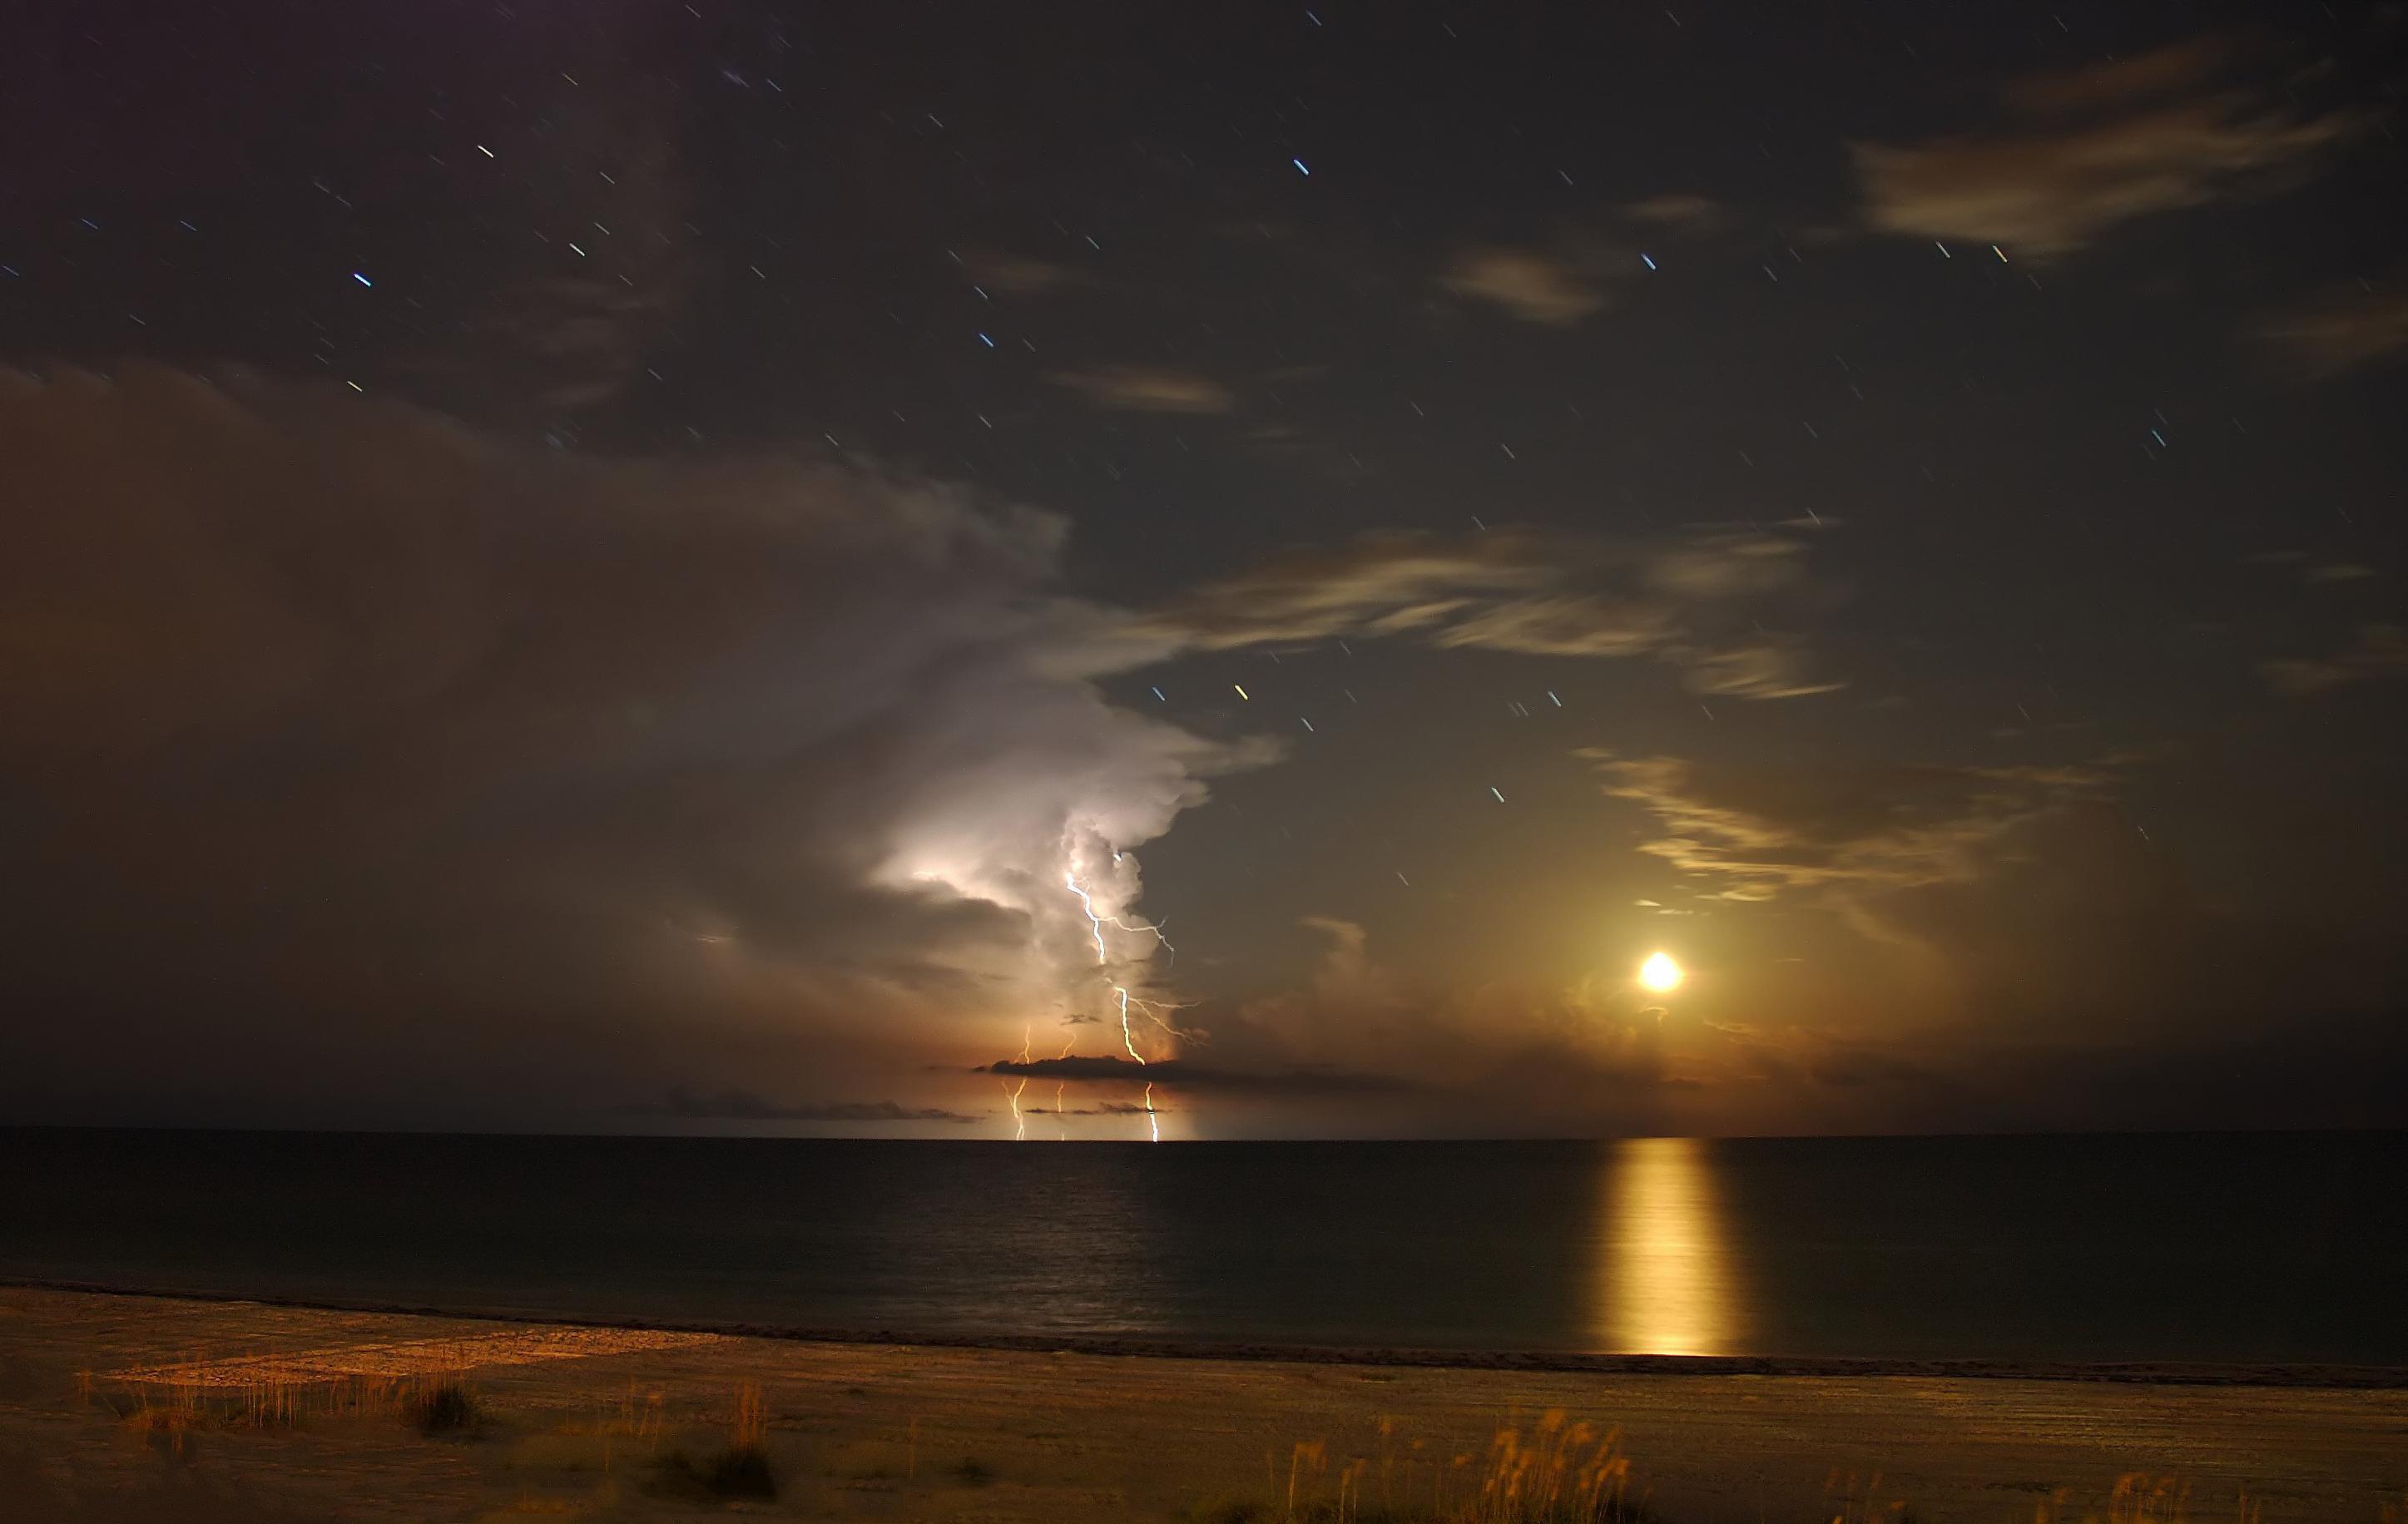 Wallpaper moon lightning gulf of mexico anna maria island florida 2894x1832